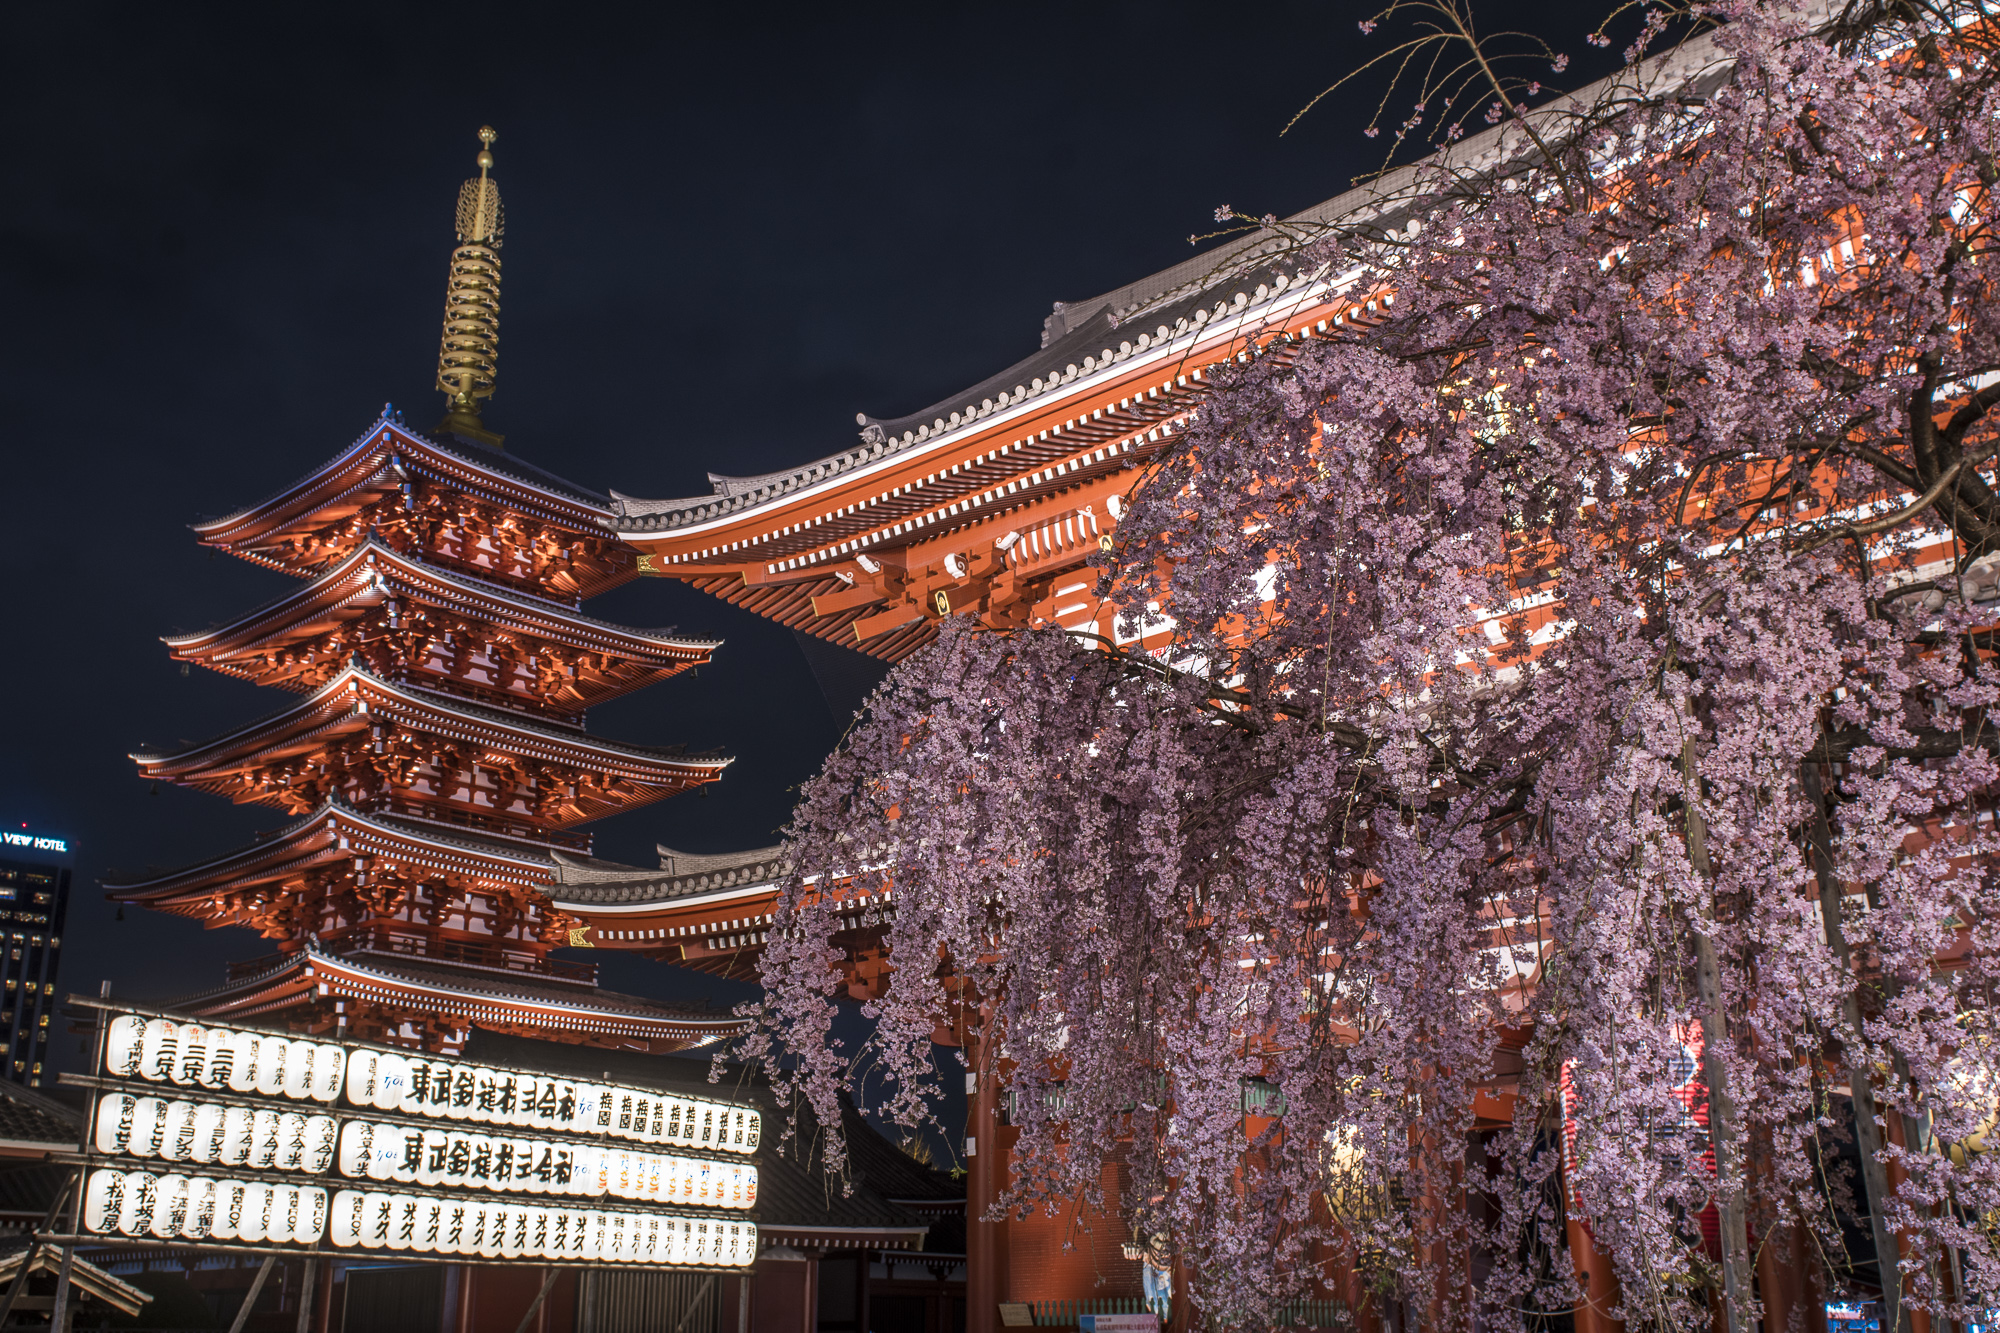 Senso-ji, Tokyo  PHOTOGRAPHY: ALEXANDER J.E. BRADLEY • NIKON D500 • AF-S NIKKOR 24-70MM Ƒ/2.8G ED @ 24MM • Ƒ/8 • 0.625sec • ISO 100